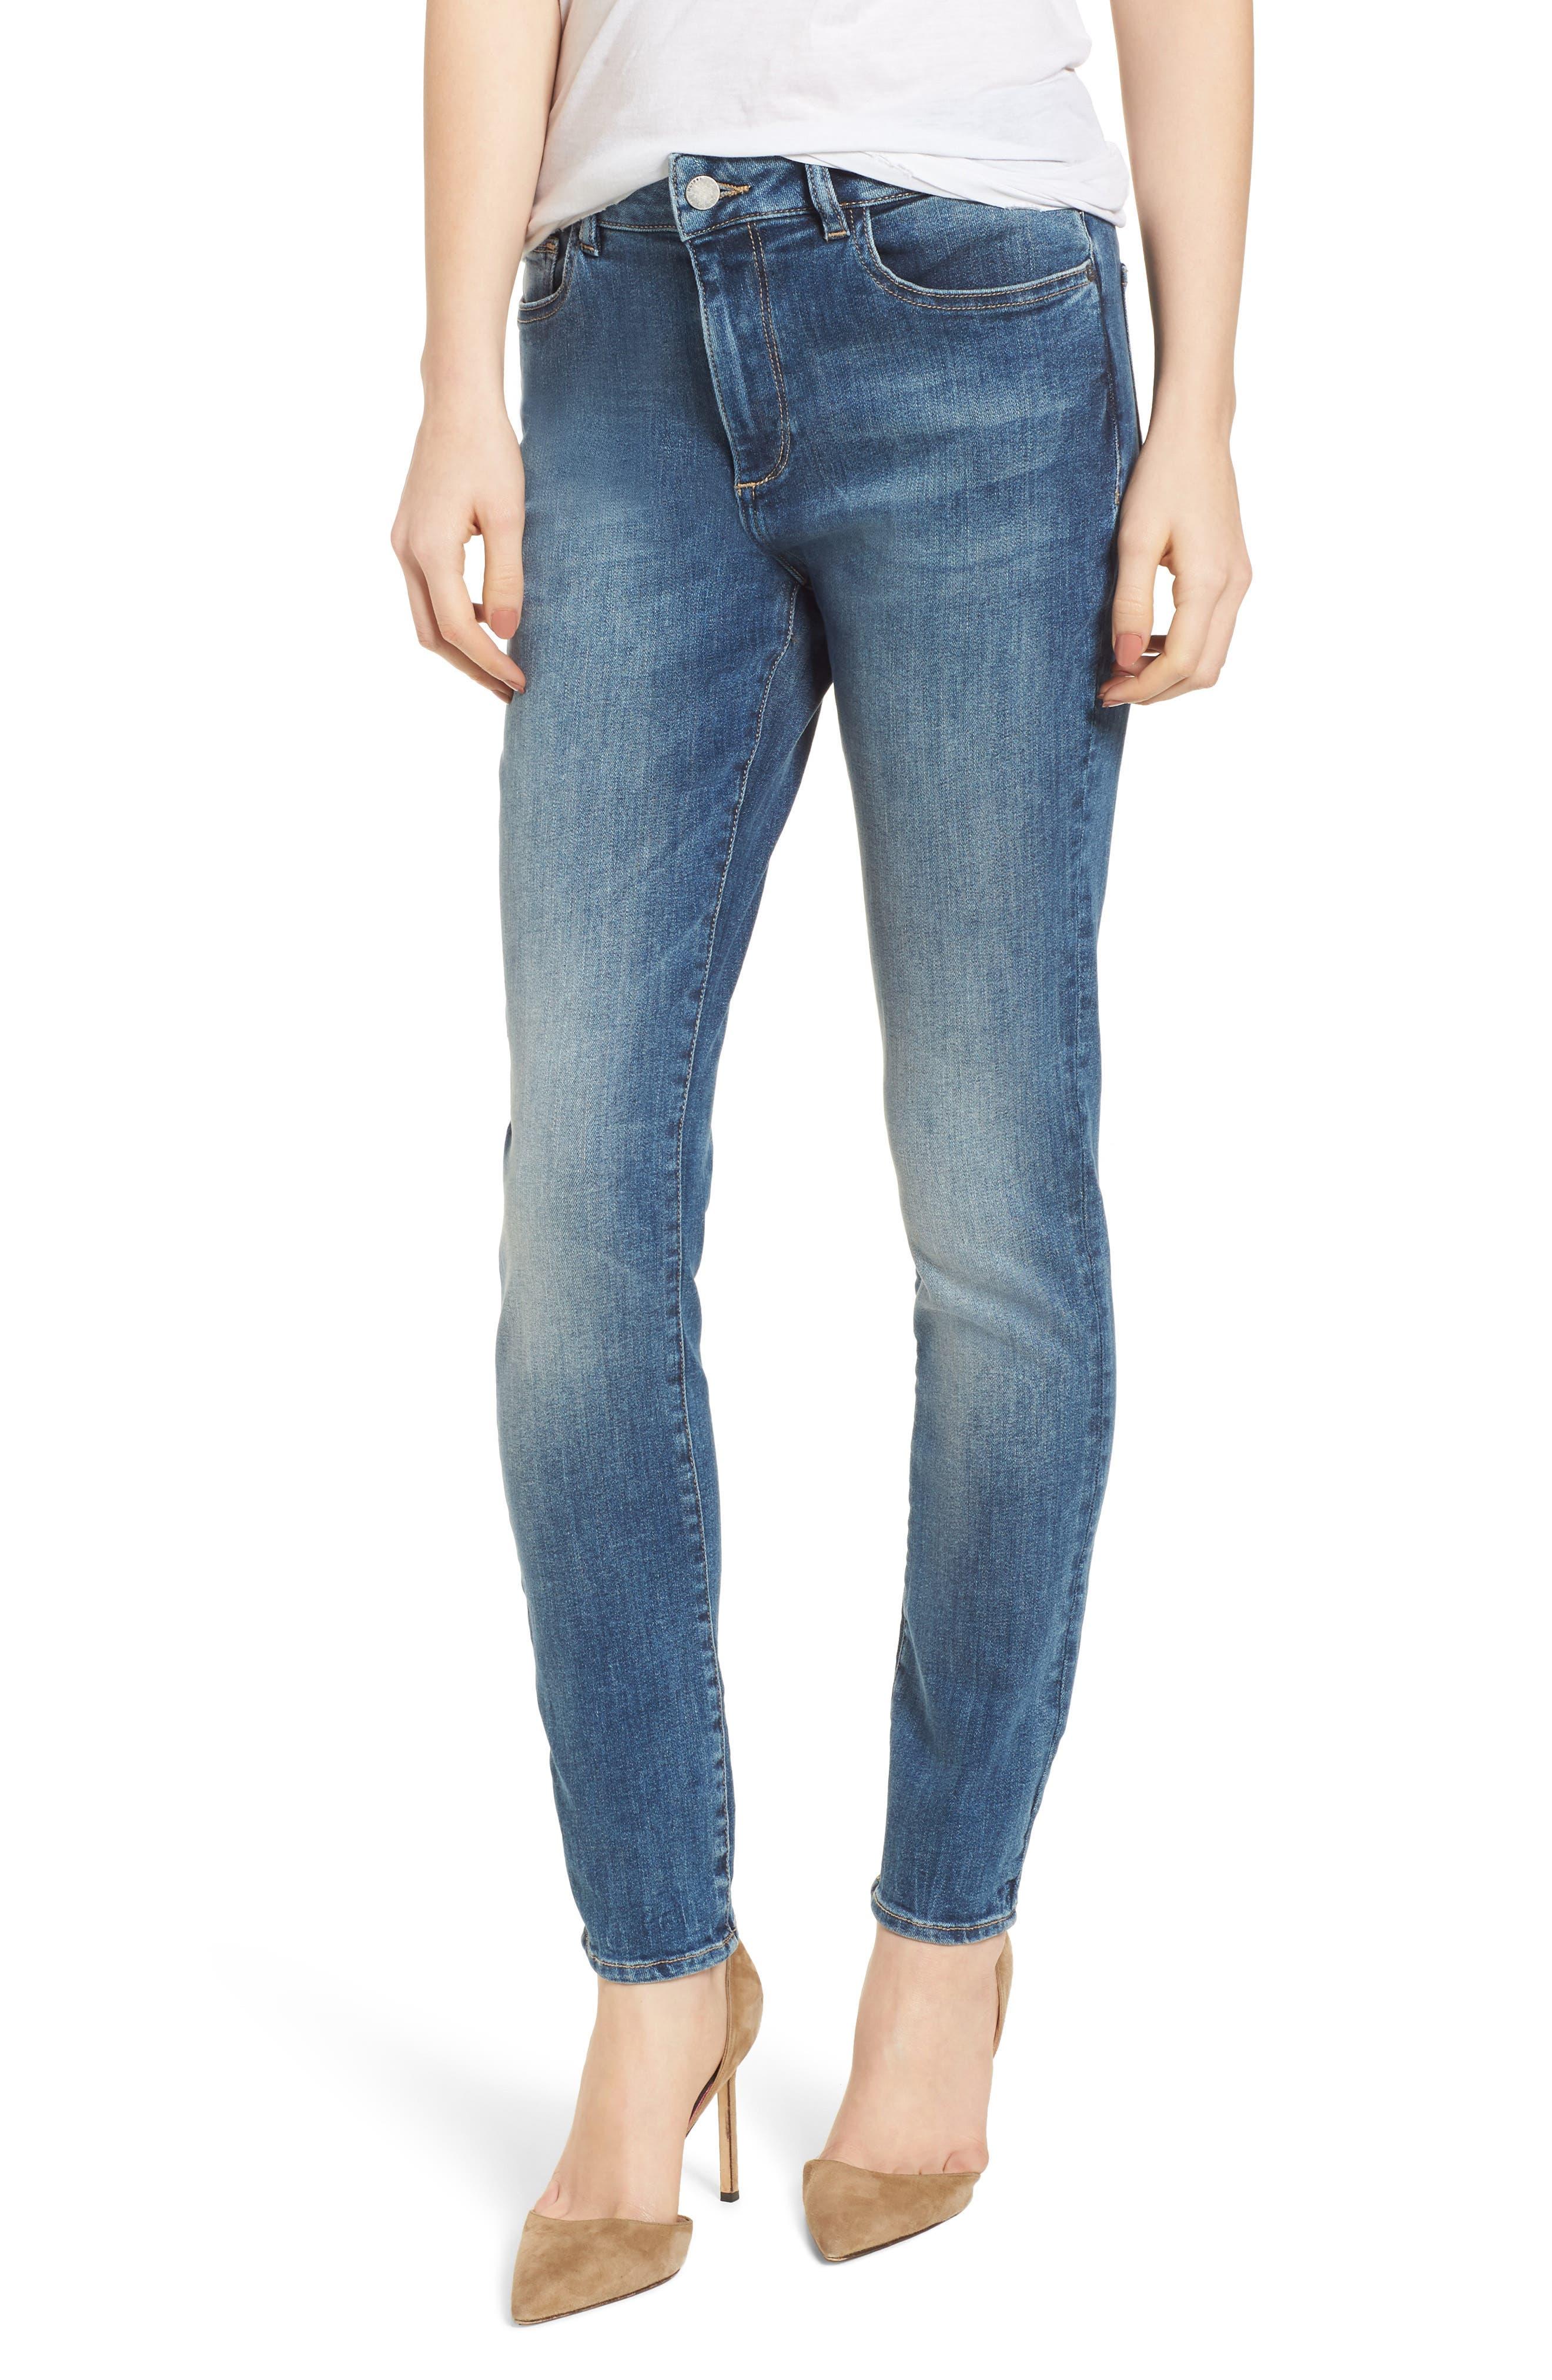 Farrow Instaslim High Waist Skinny Jeans,                             Main thumbnail 1, color,                             Wells